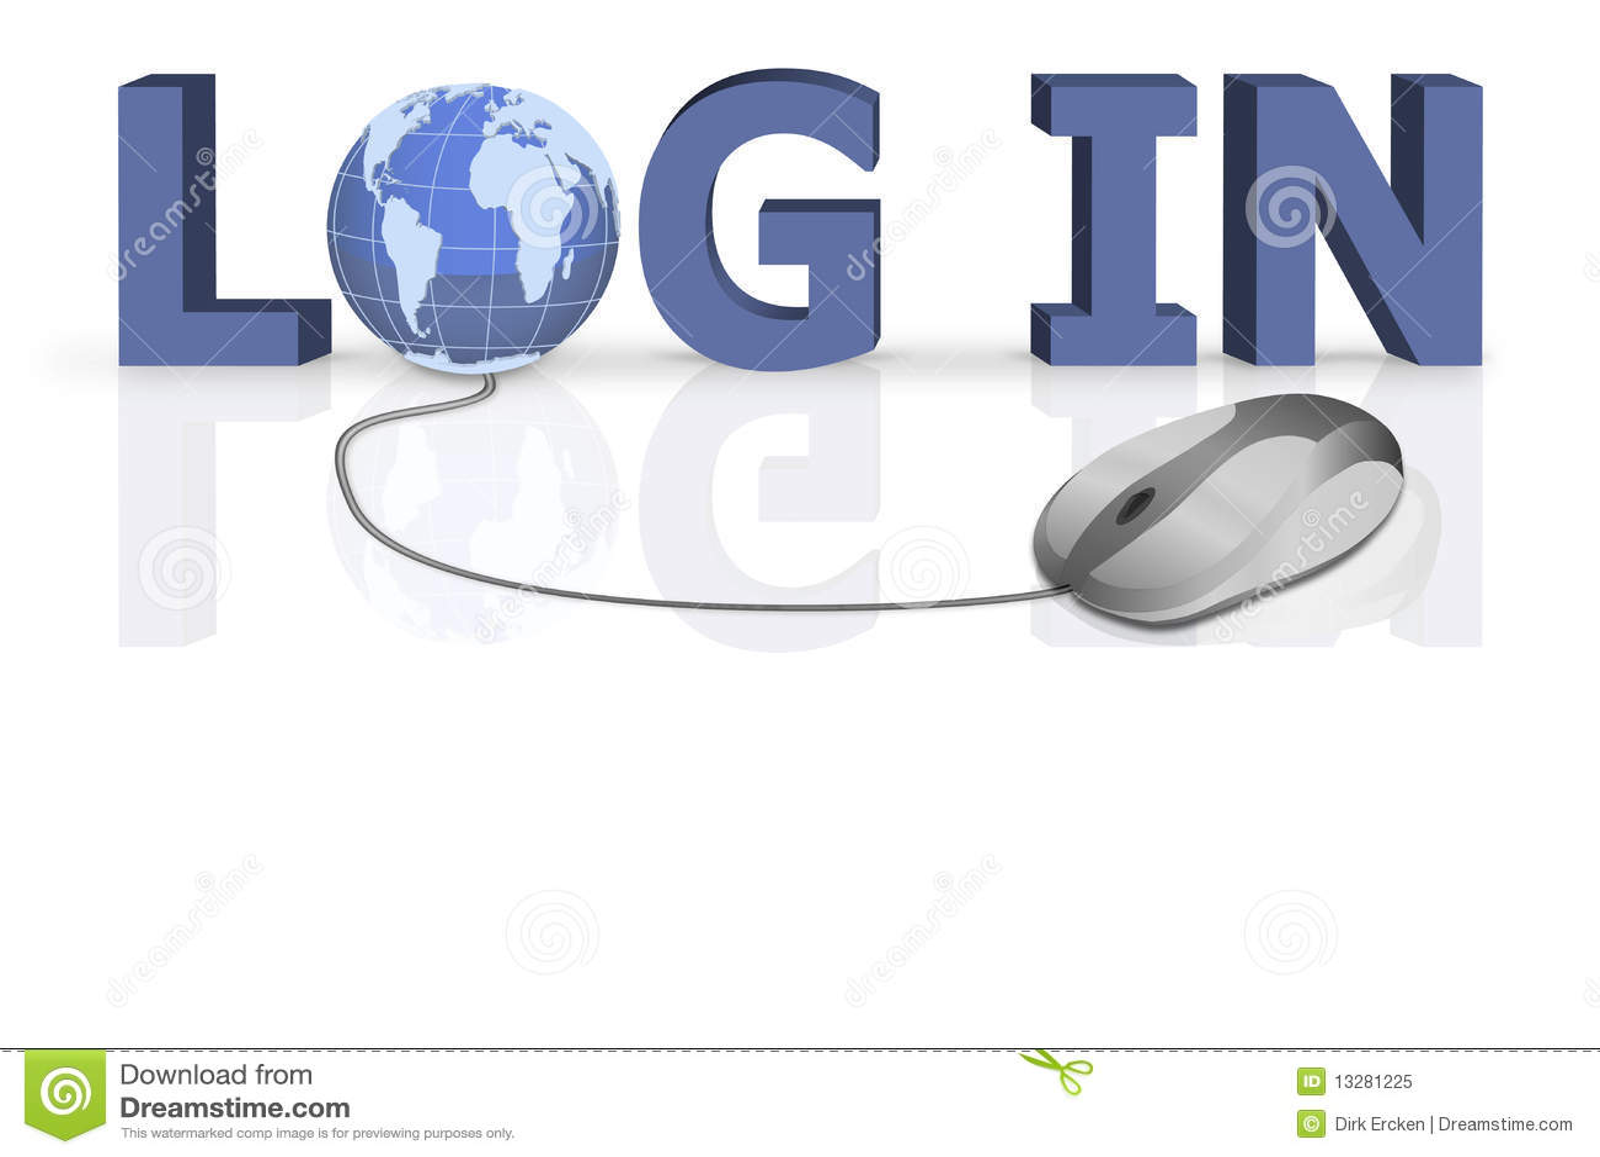 Login Logon Open Your Website On Www Stock Illustration ...